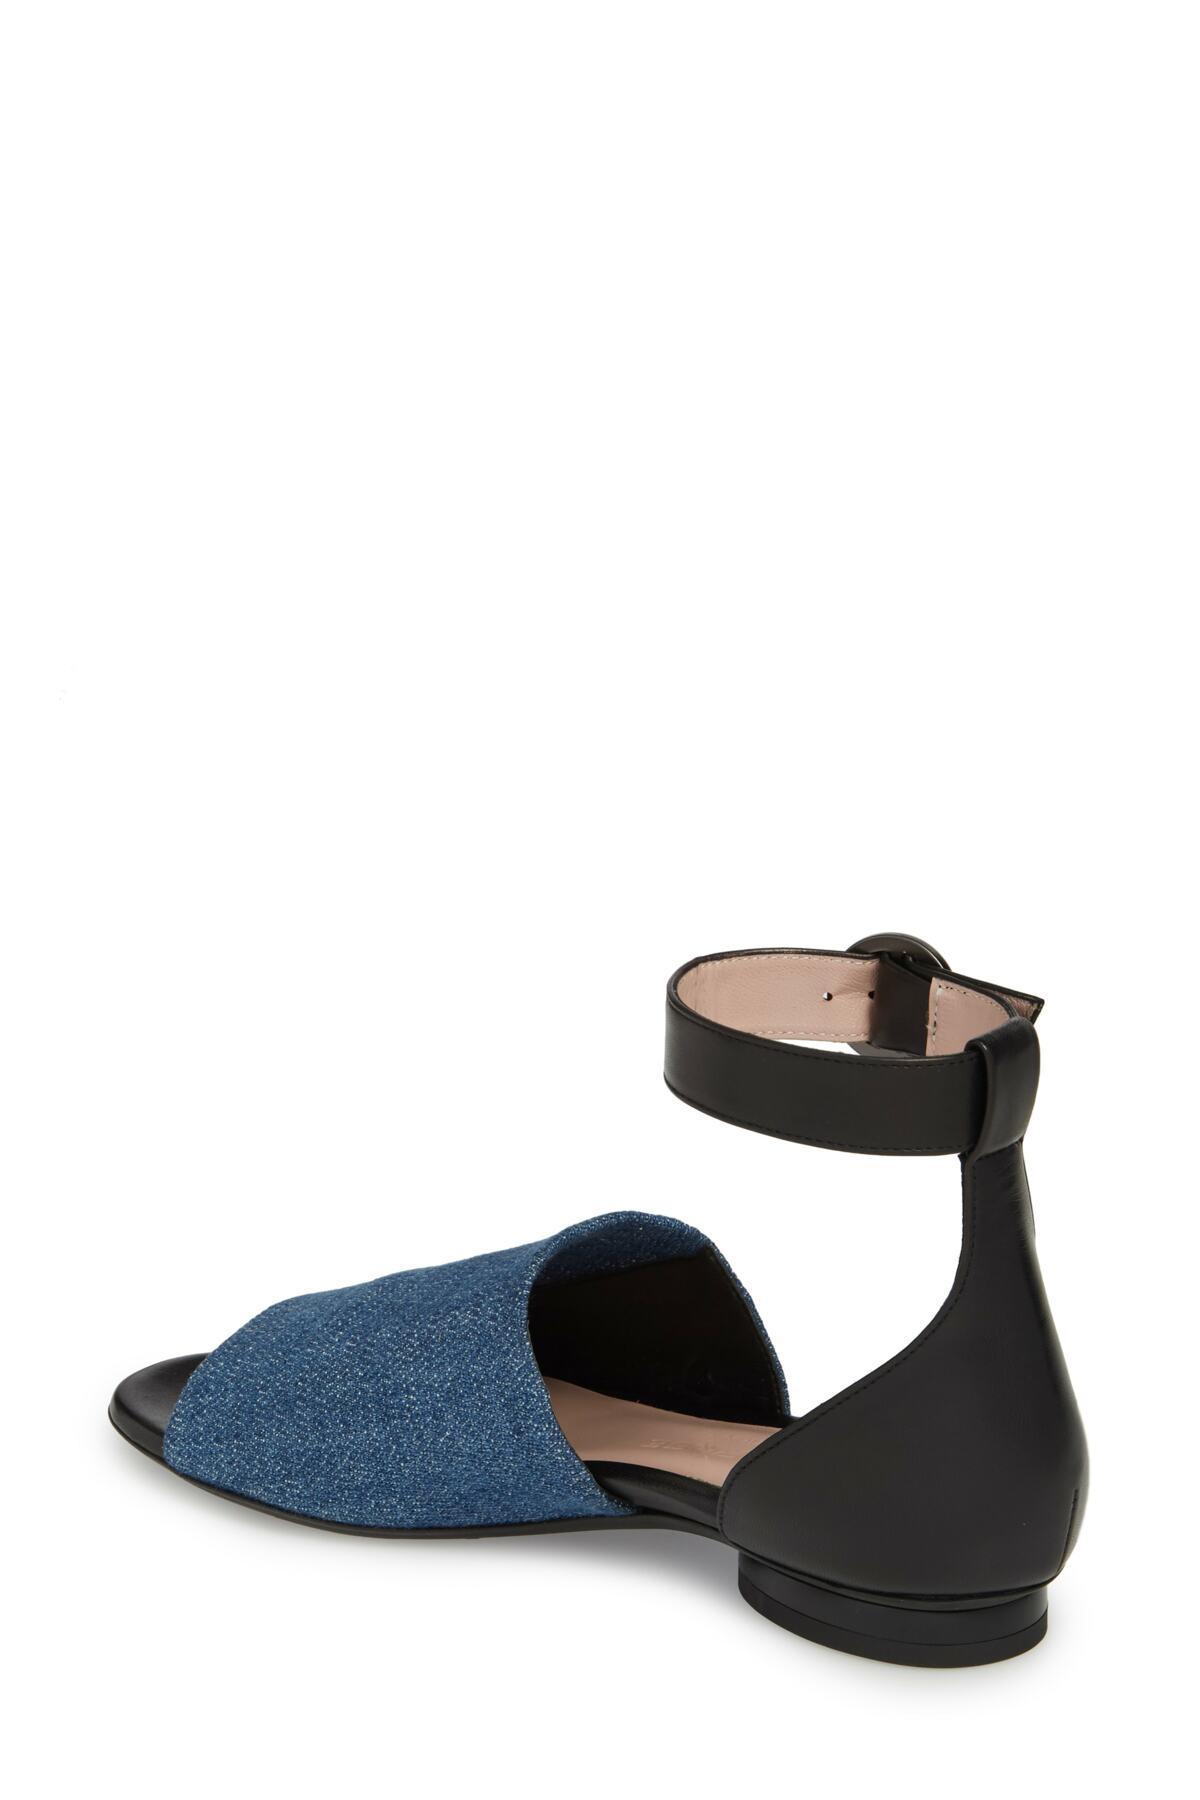 5c662f203a74 Lyst - Taryn Rose Donya Ankle Strap Sandal (women) in Blue